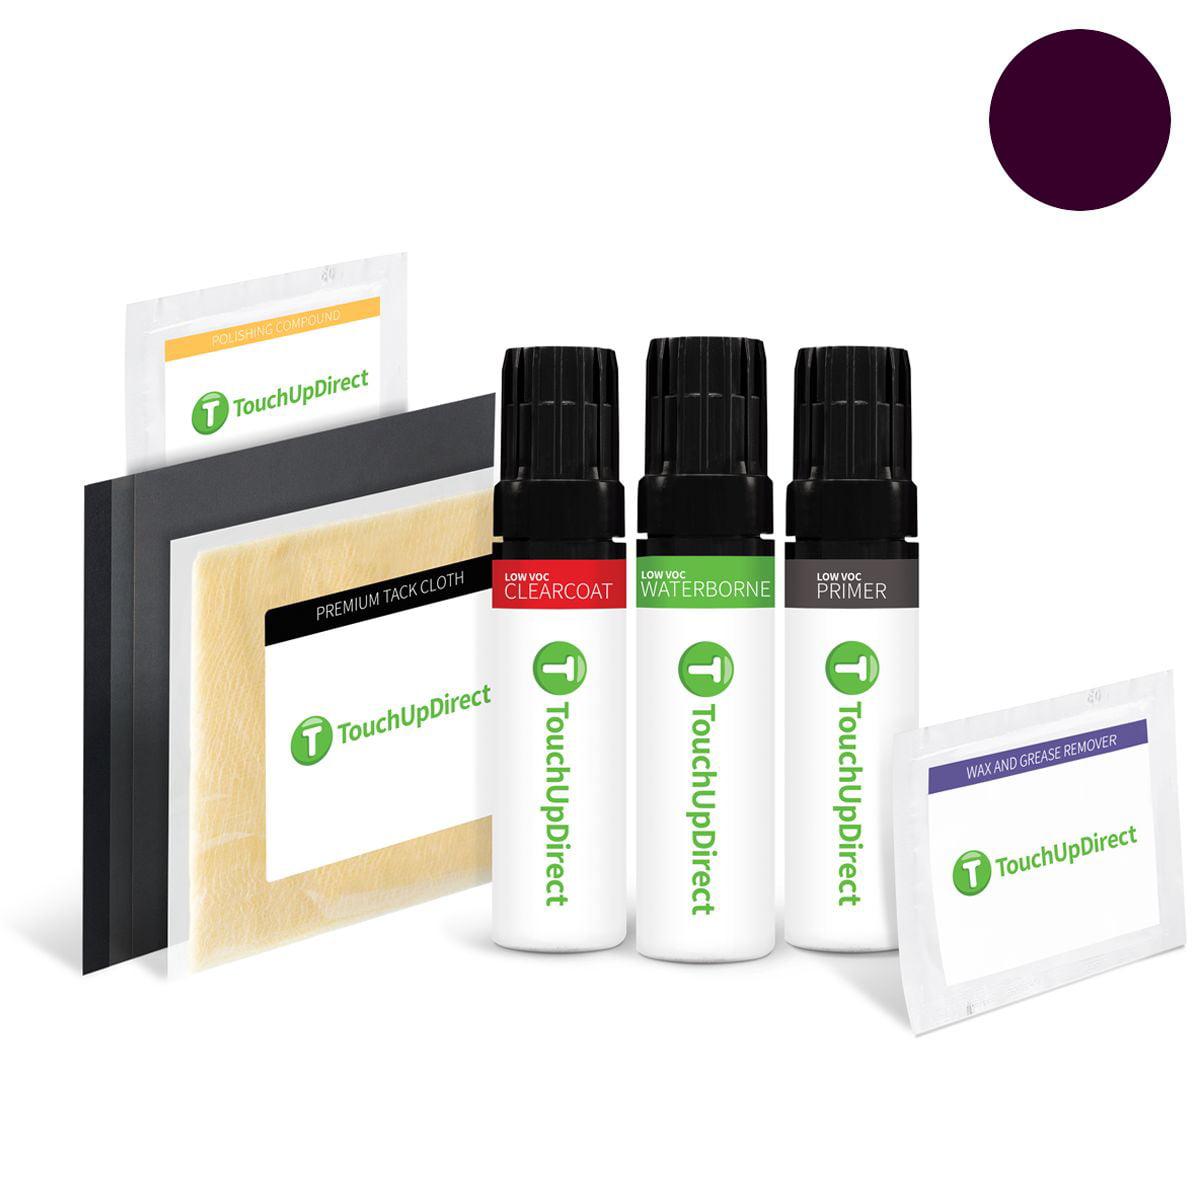 Kia Dark Cherry Metallic Touch Up Paint (IRR)- Package